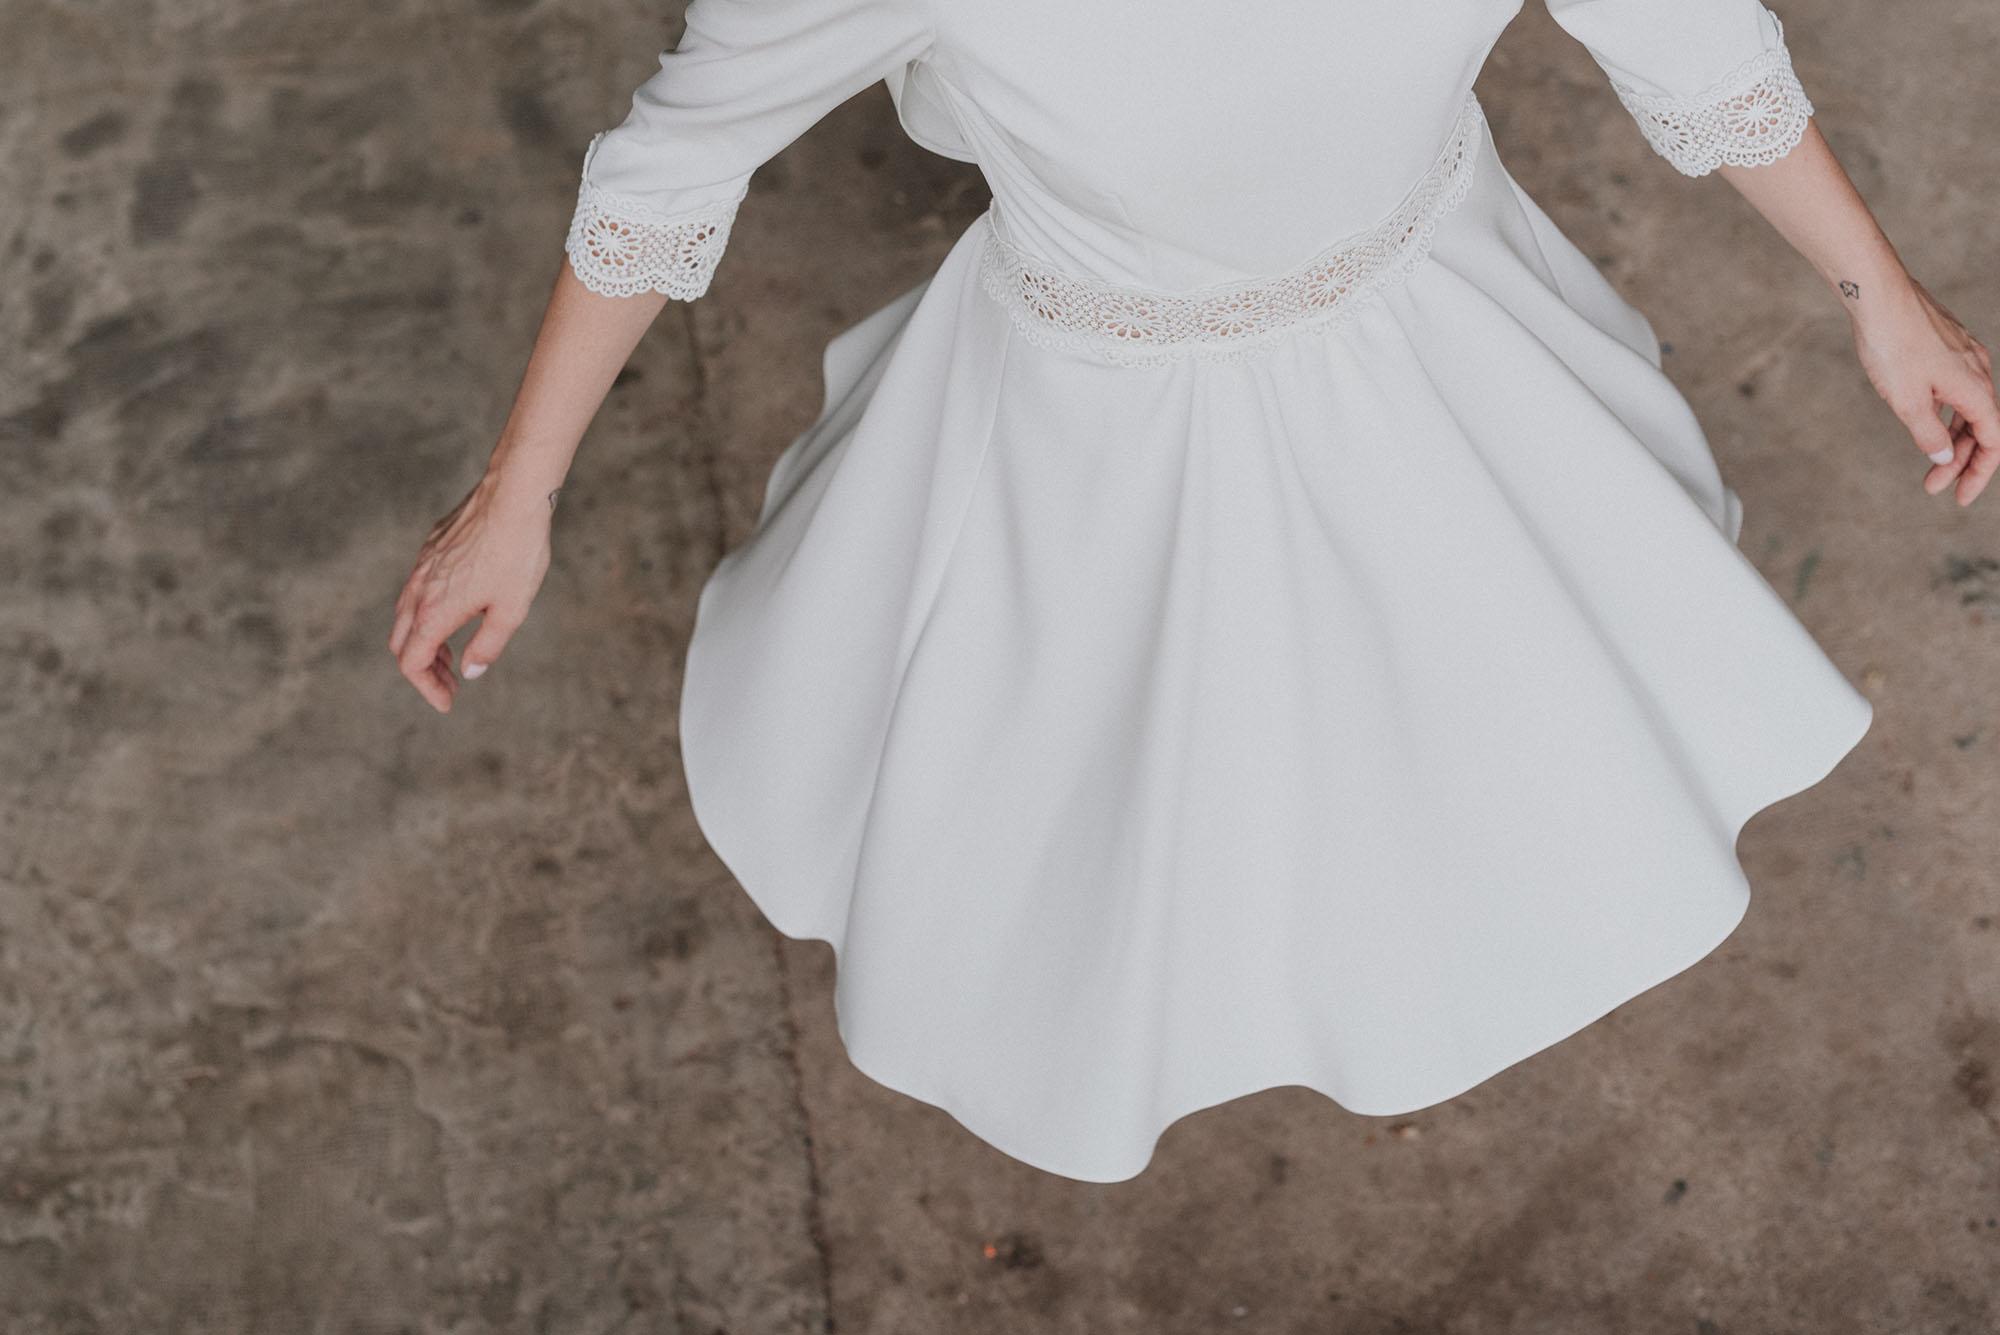 Robe de mariee lyon sur mesure